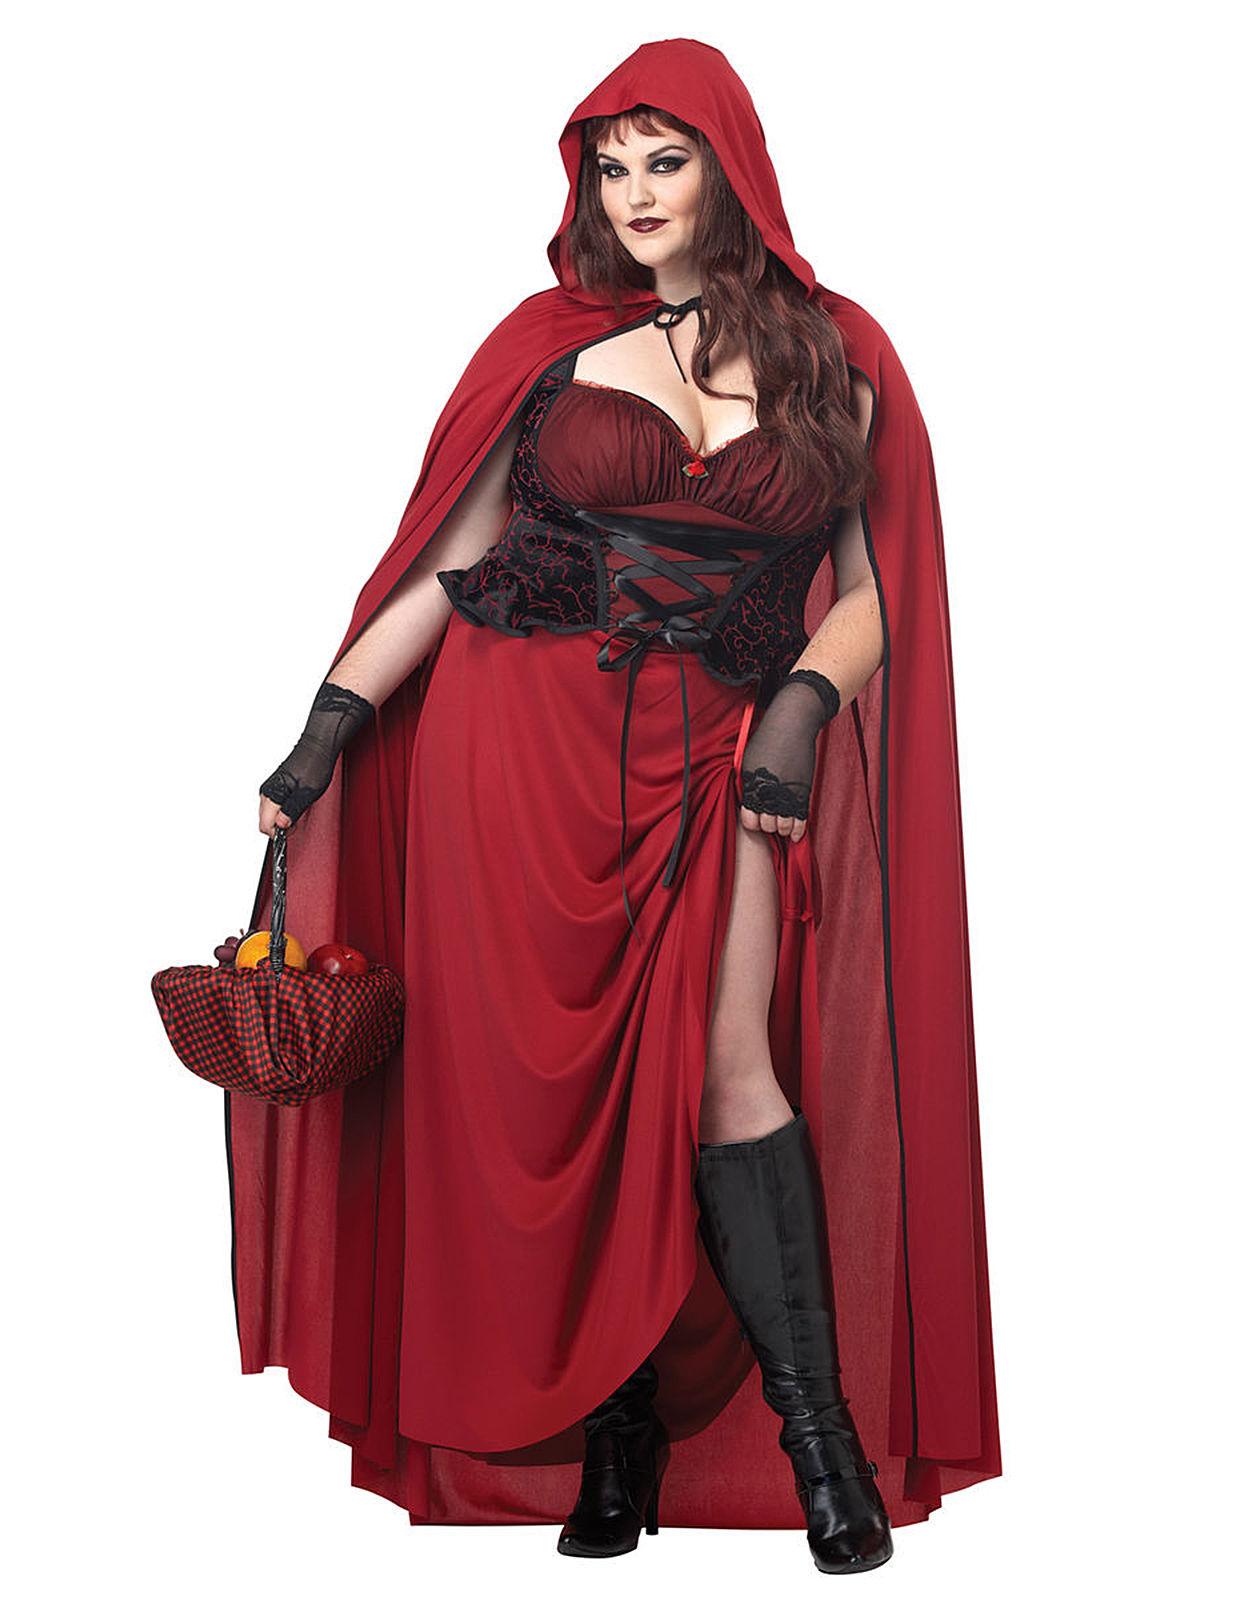 Disfraz de Halloween caperucita gótica Mujer  Disfraces adultos fcfede3b4f51